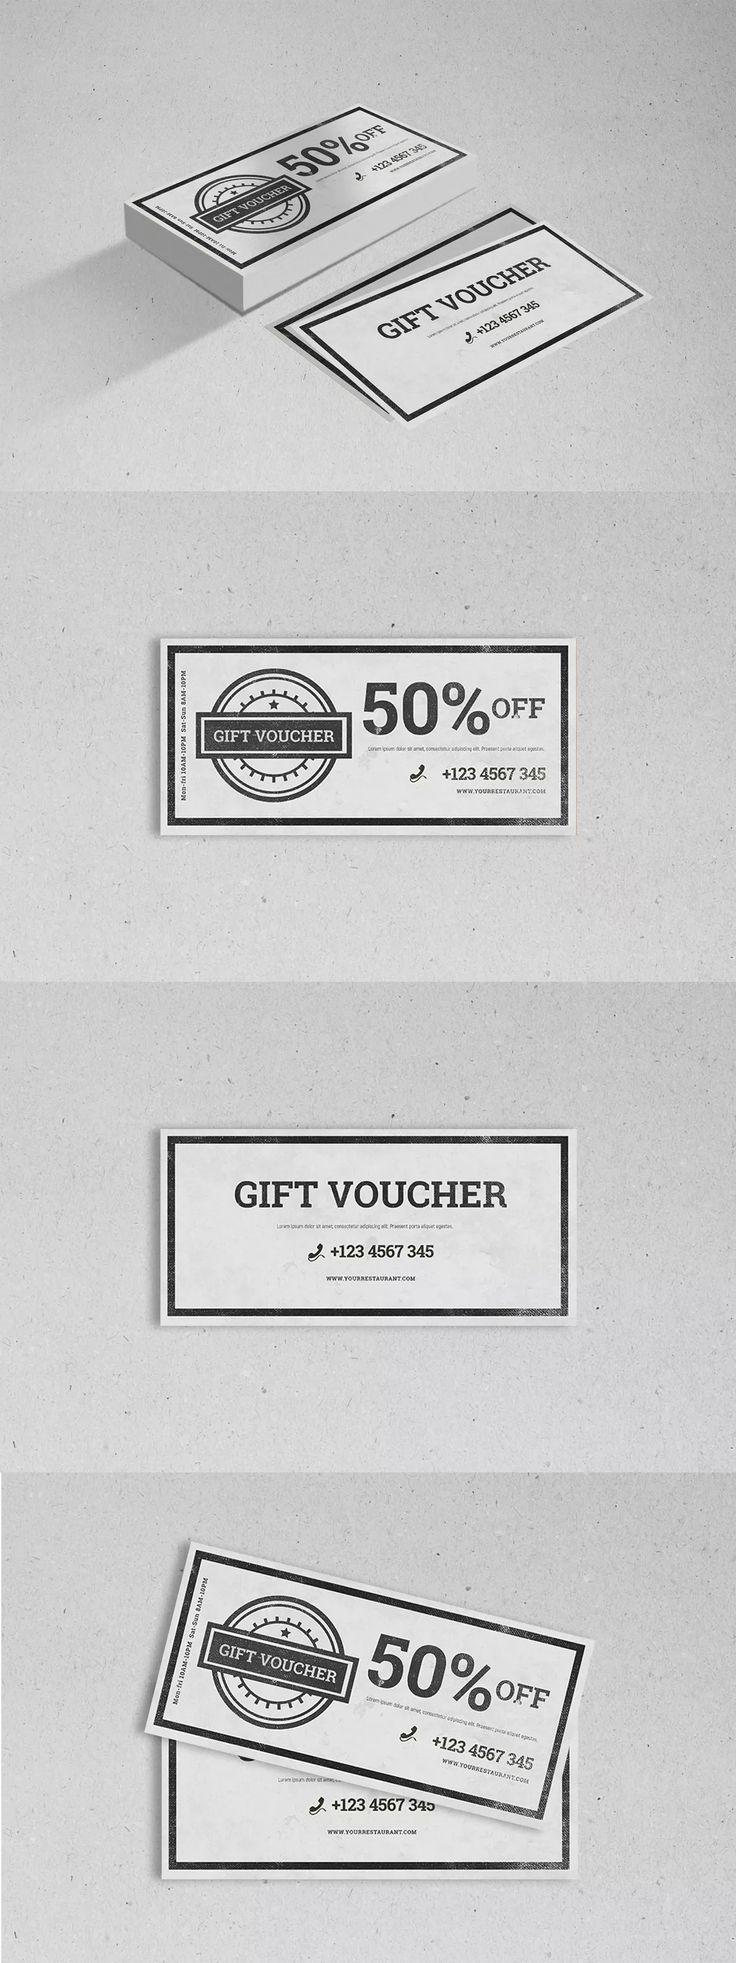 25 best Gift Voucher Design Templates images on Pinterest | Design ...